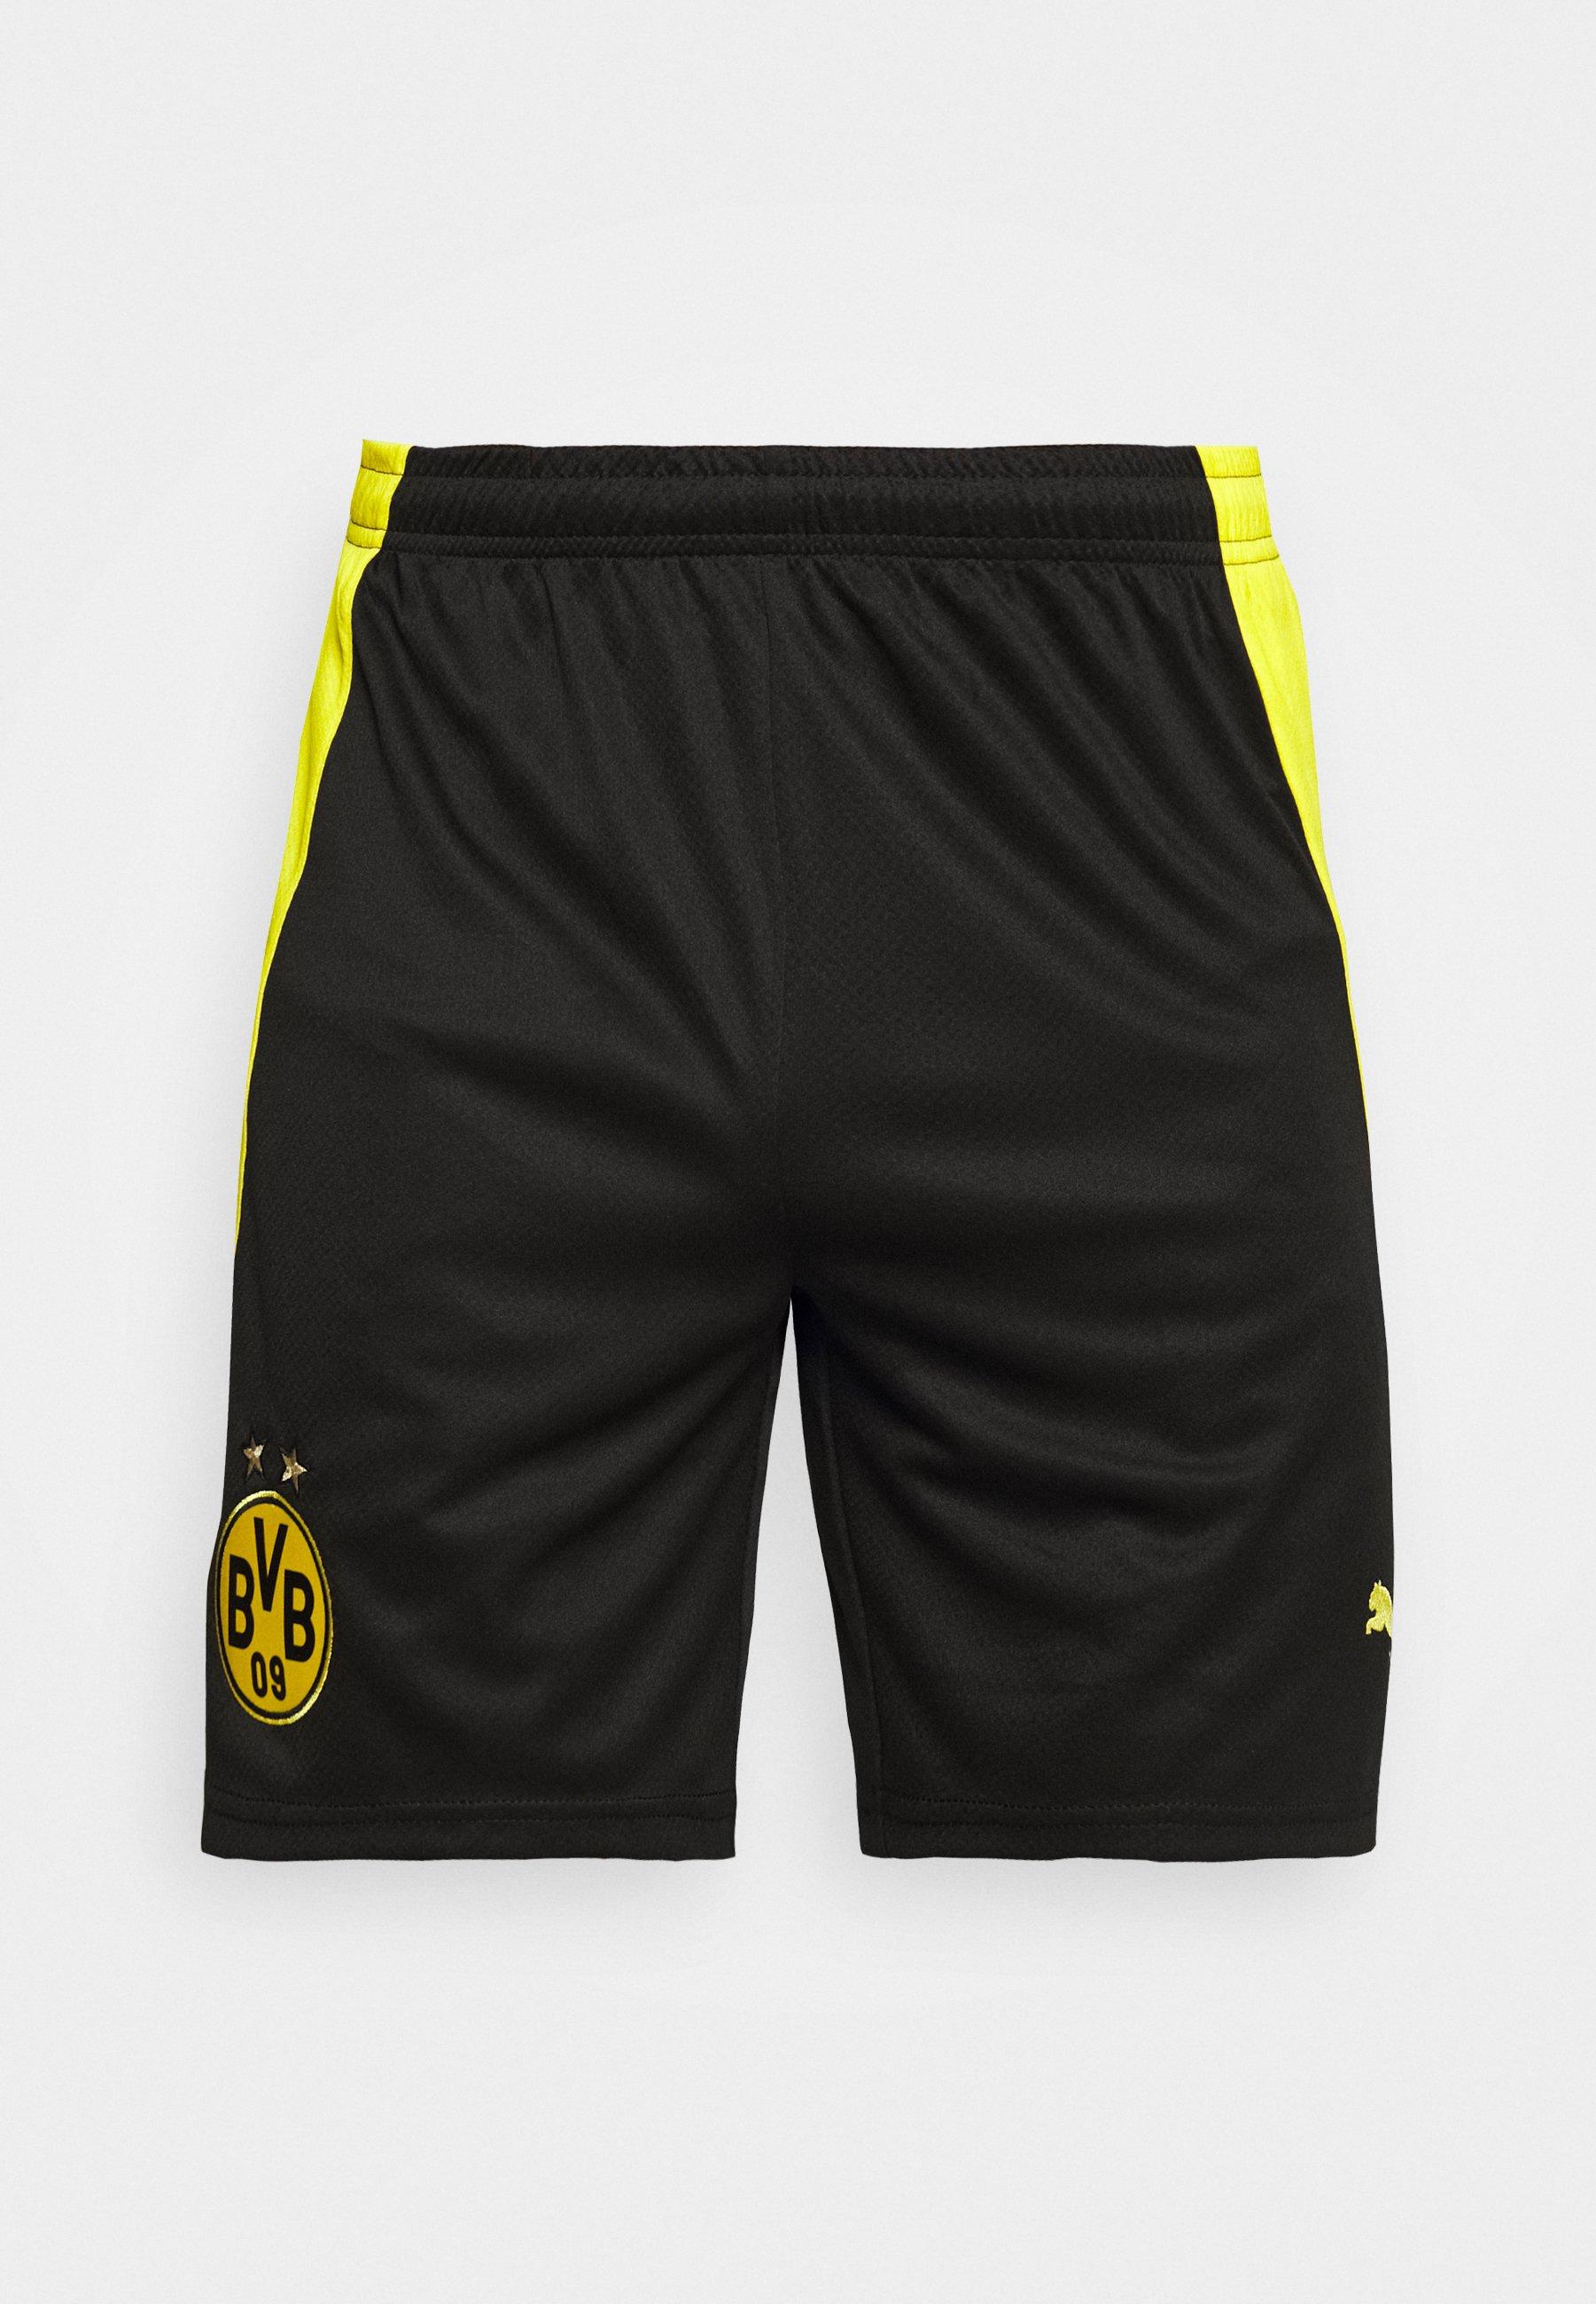 BVB BORUSSIA DORTMUND SHORTS REPLICA kurze Sporthose blackcyber yellow